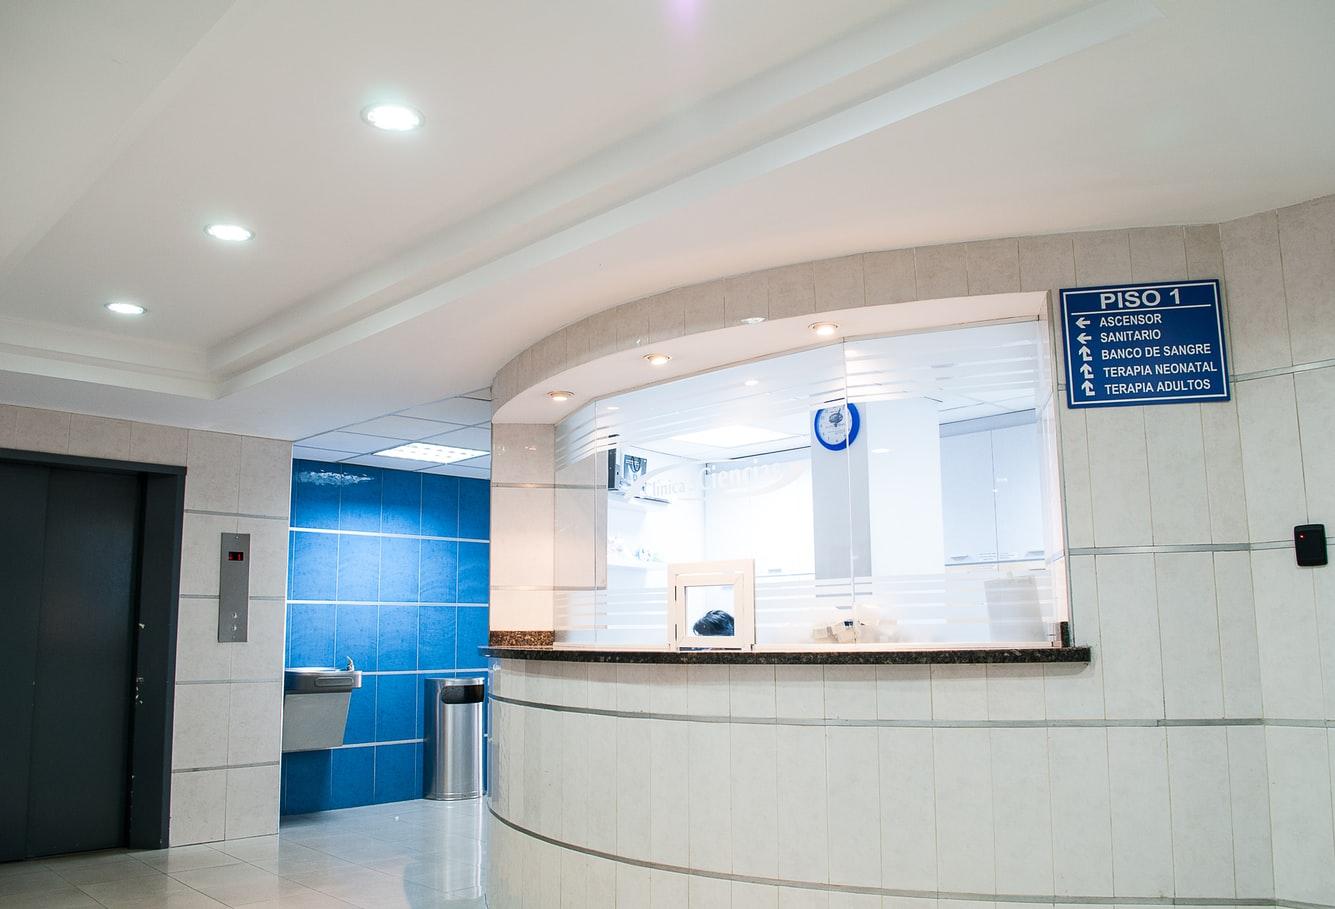 hospital-reception